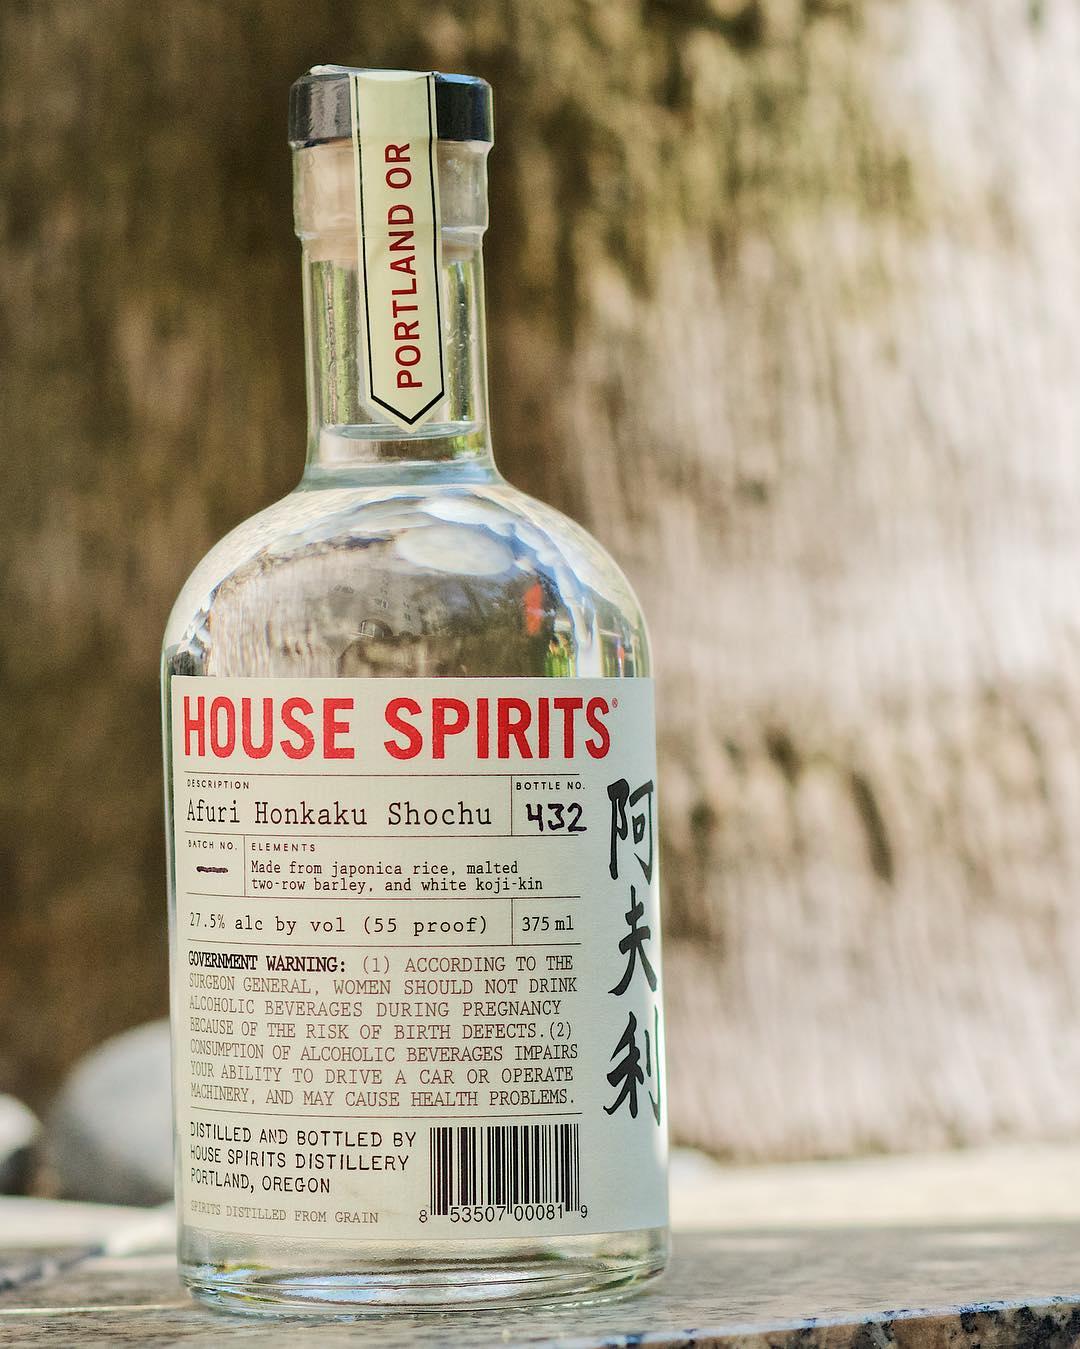 Best of Brooklyn Festival - House Spirits Distillery